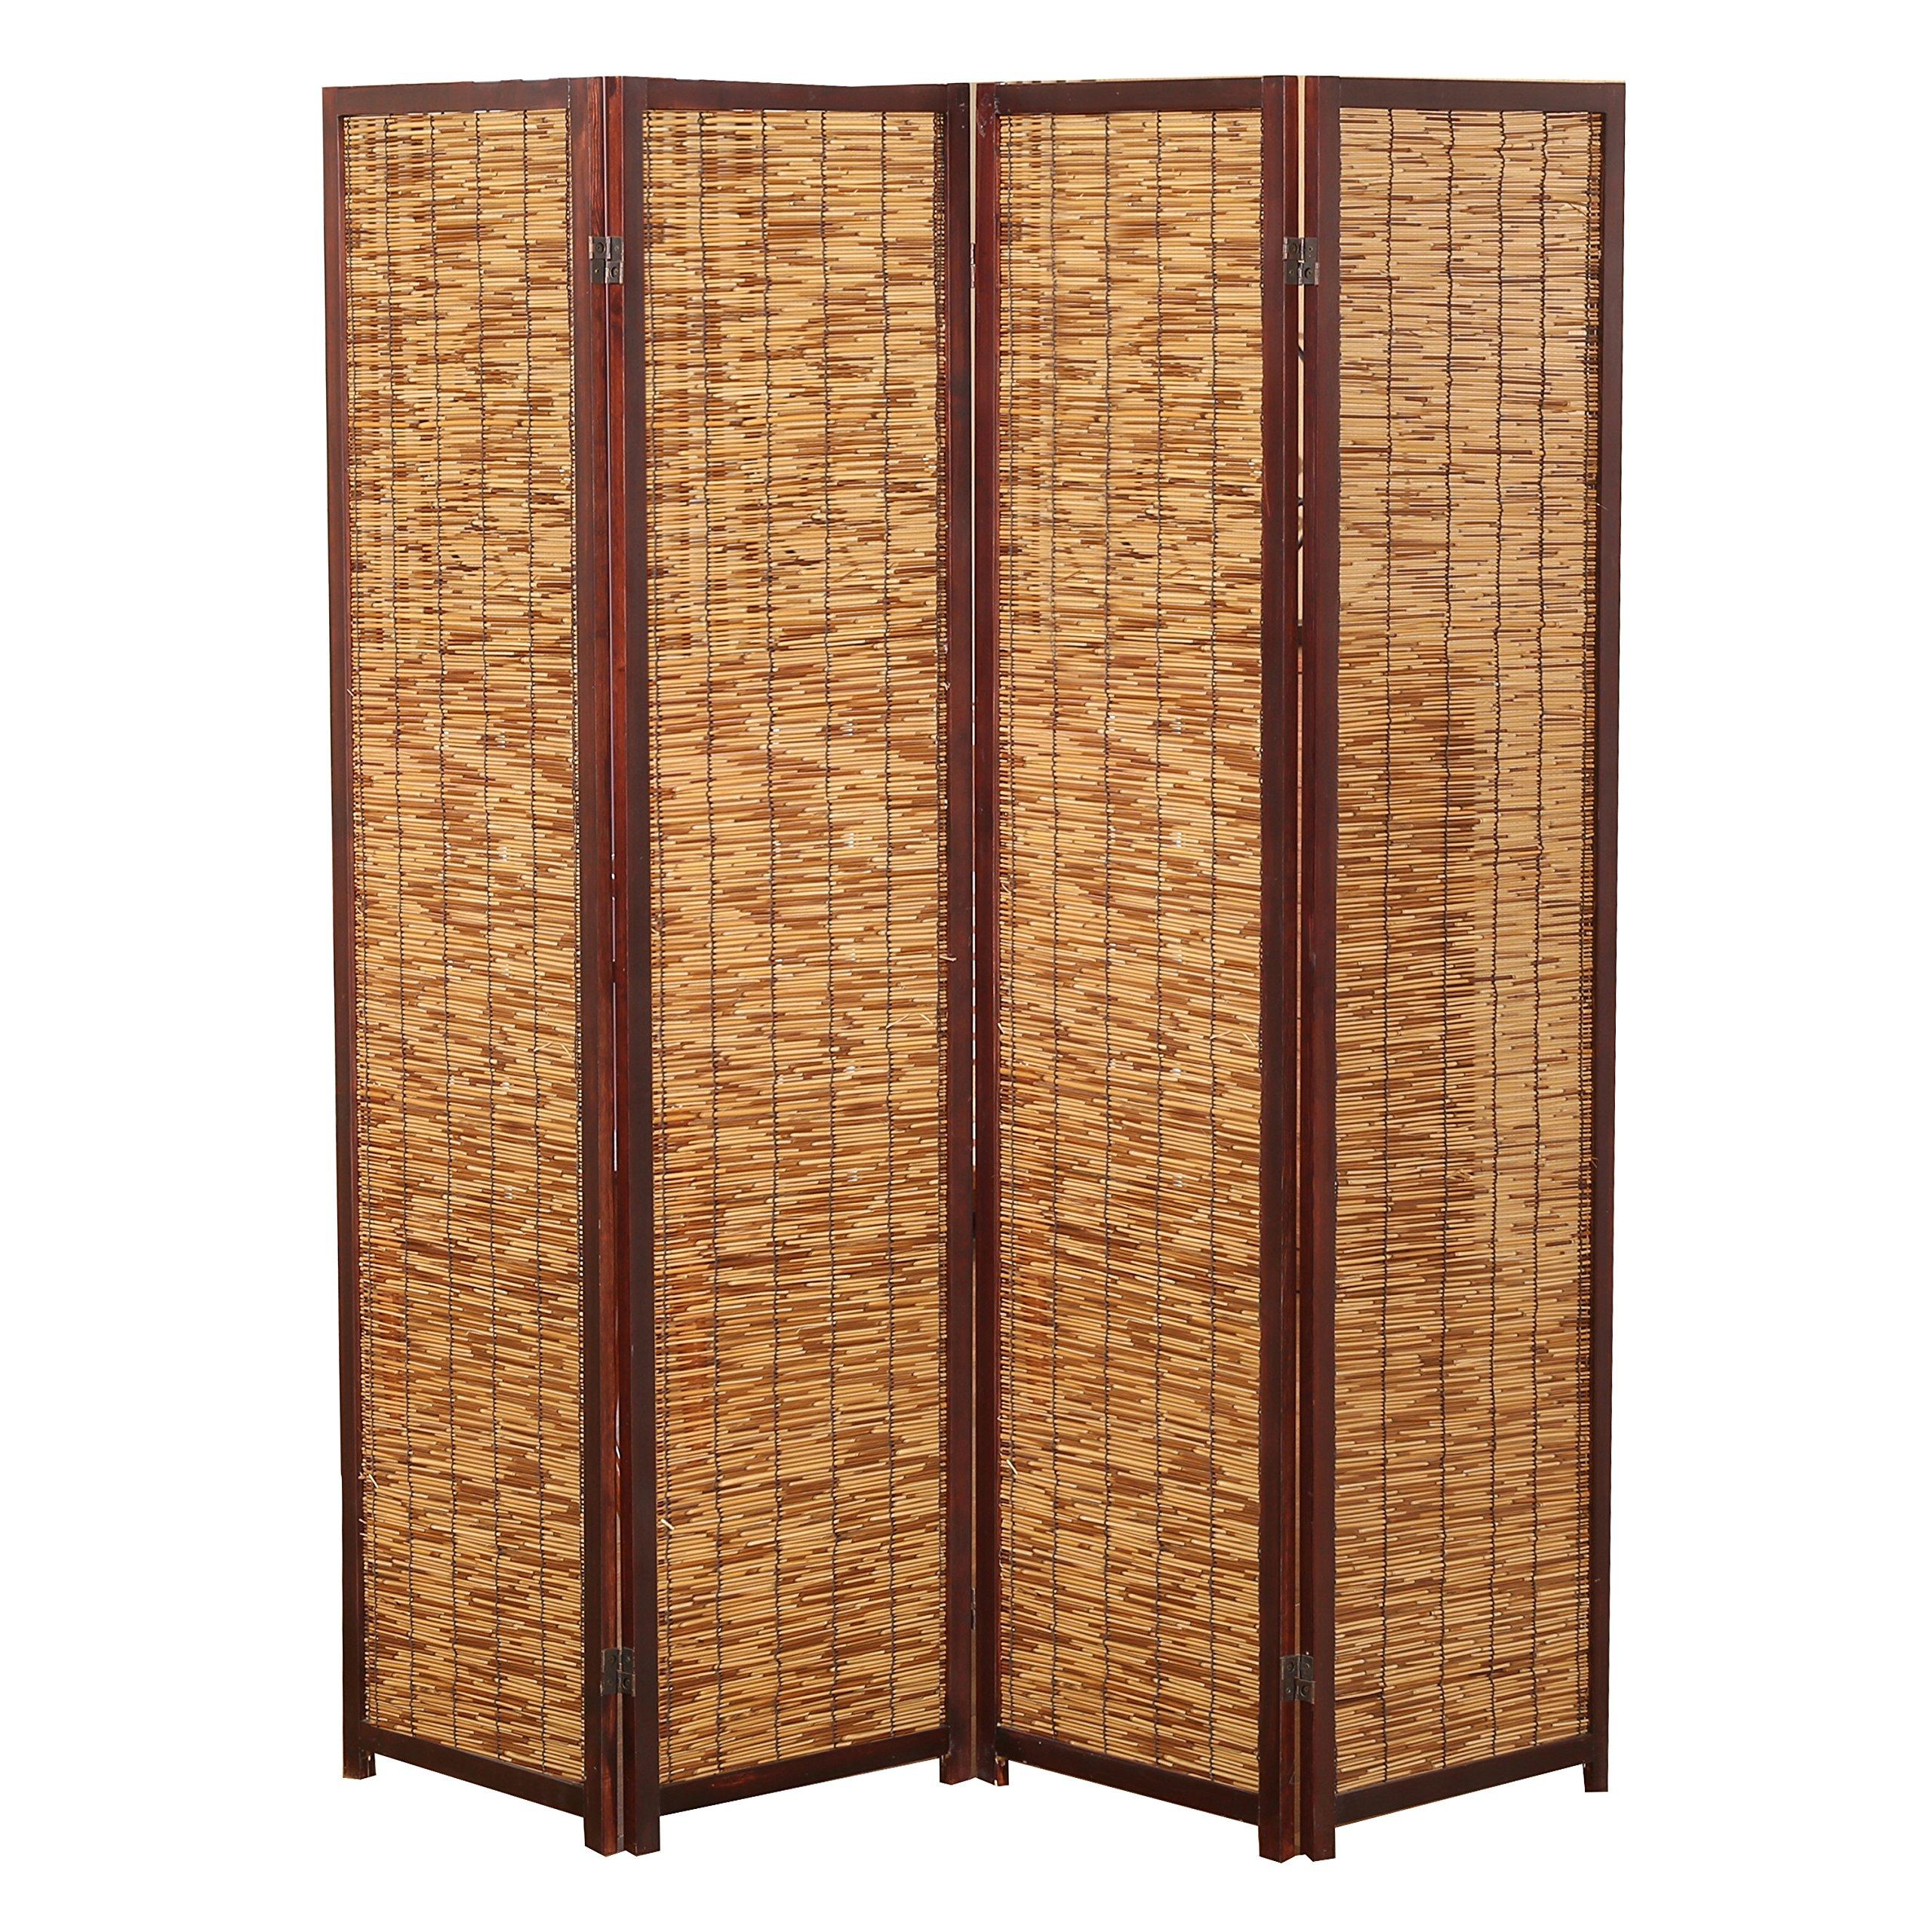 Decorative 4 Panel Wood & Bamboo Folding Room Divider Screen, Brown